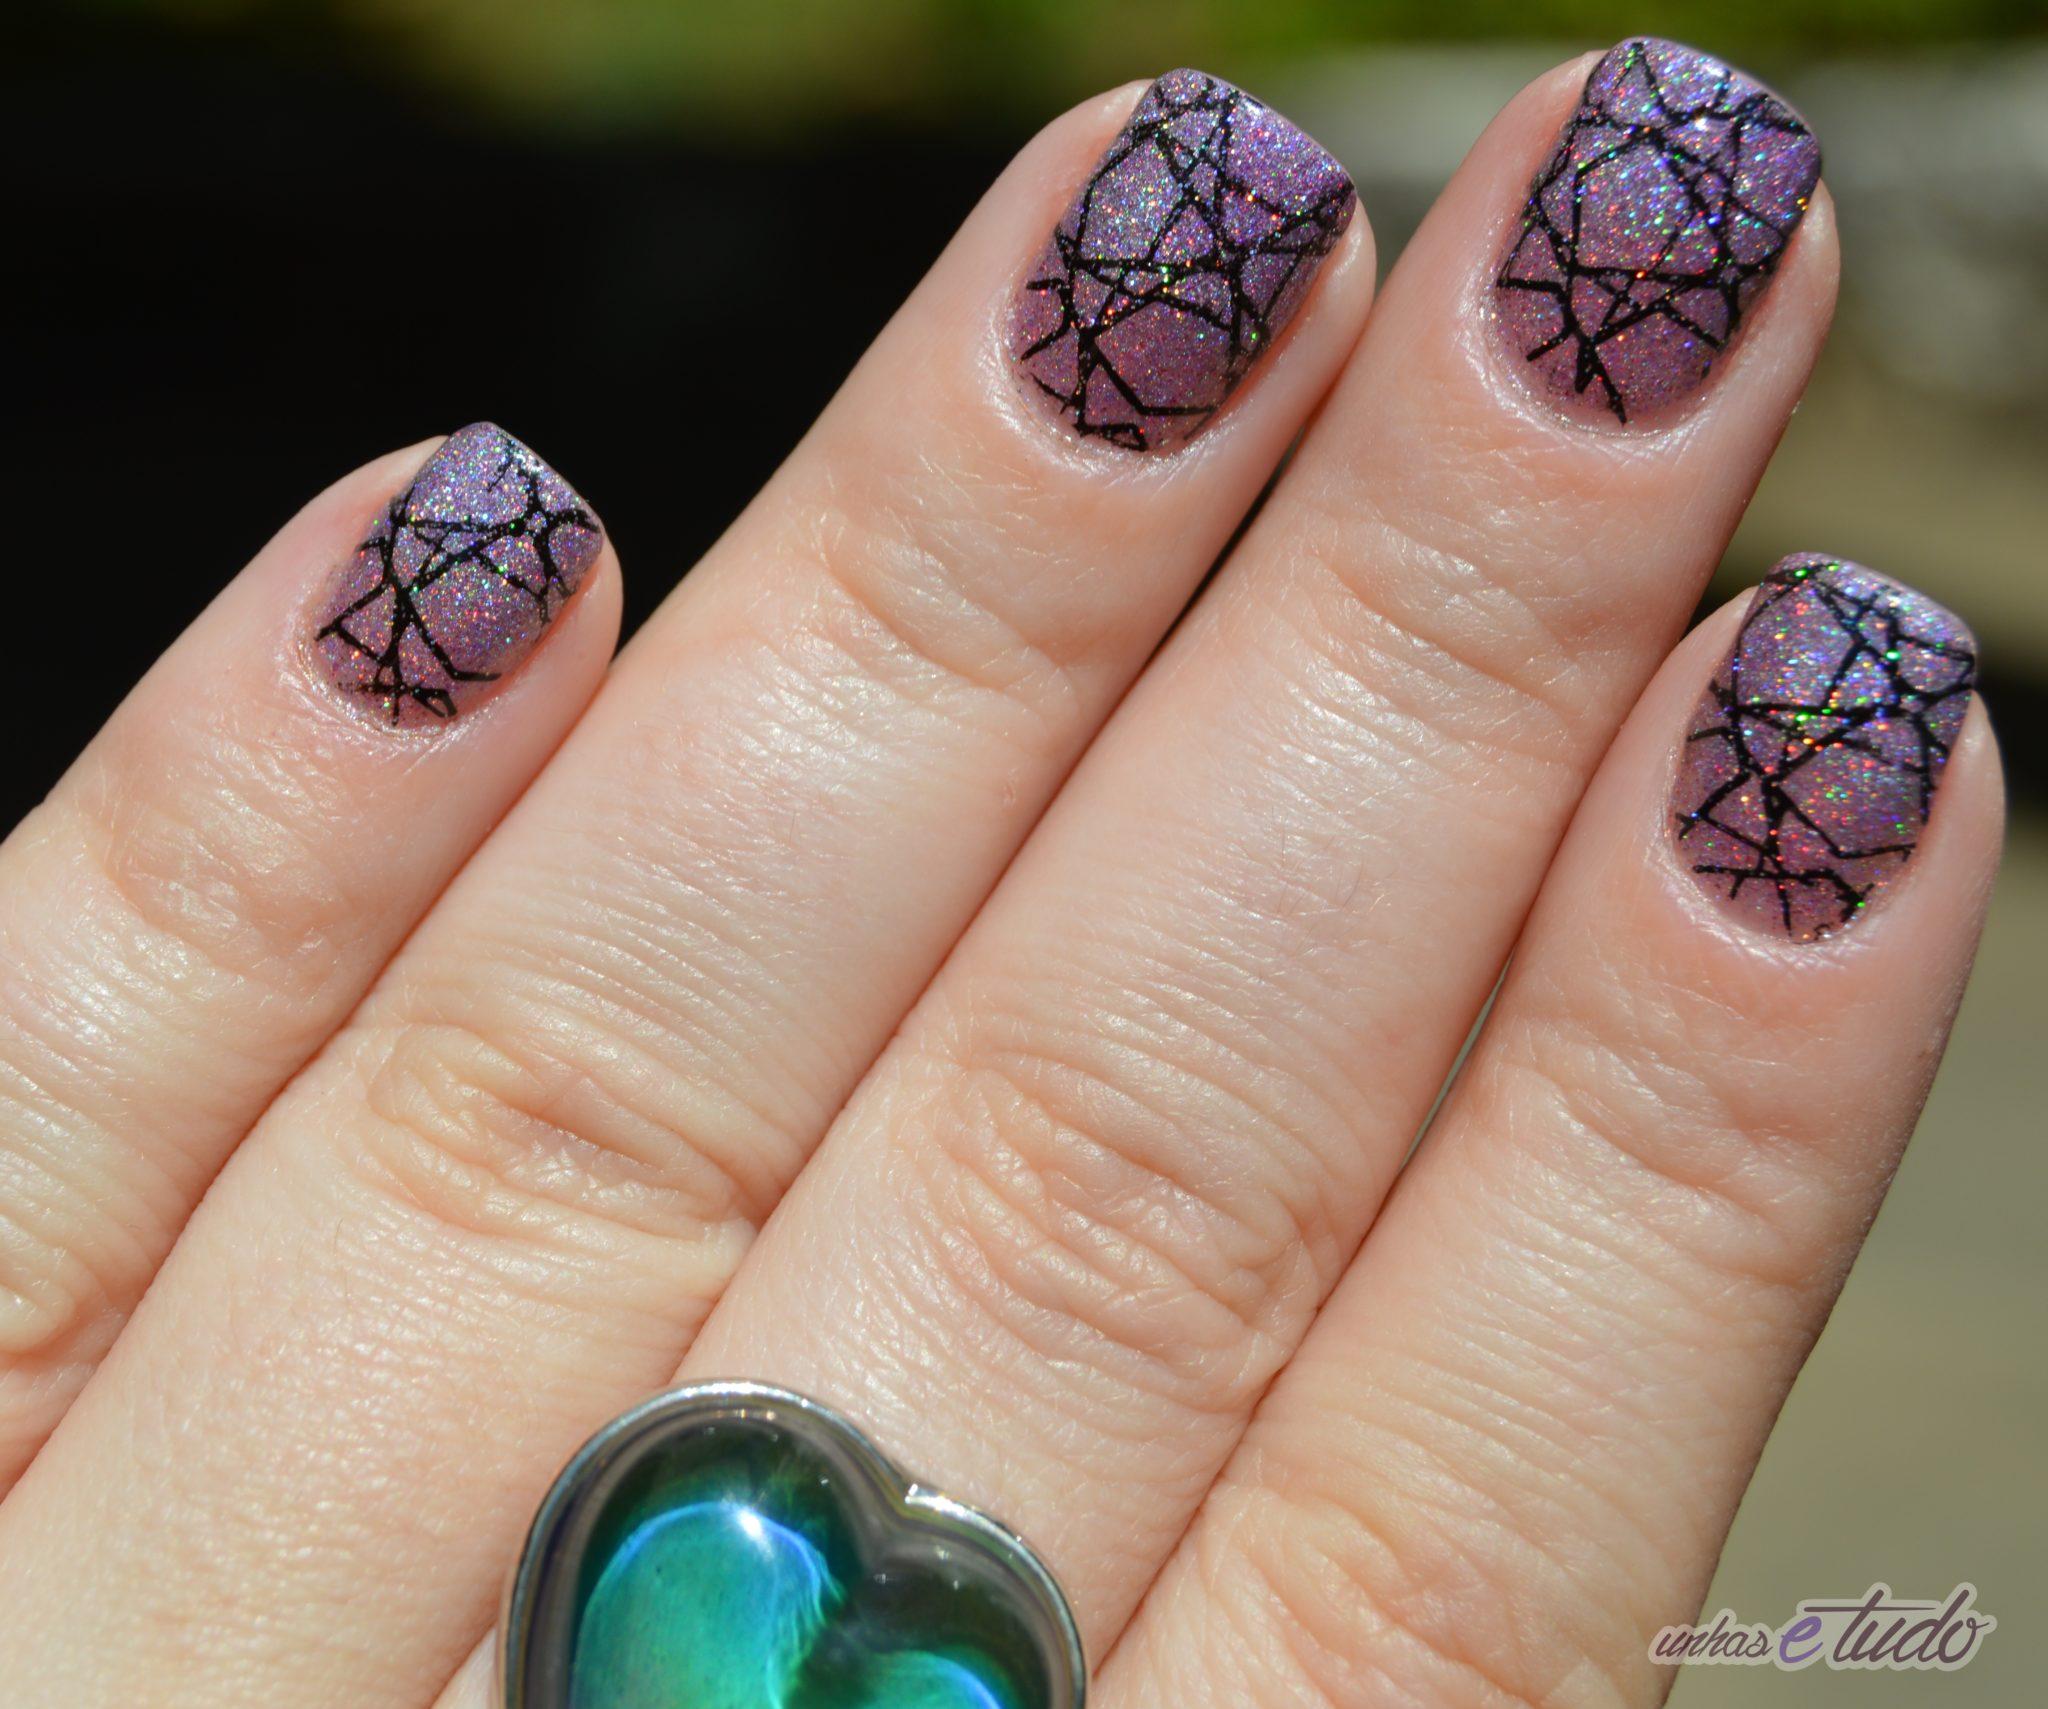 vm-vidrinhos-lilac-luxury-carimbado